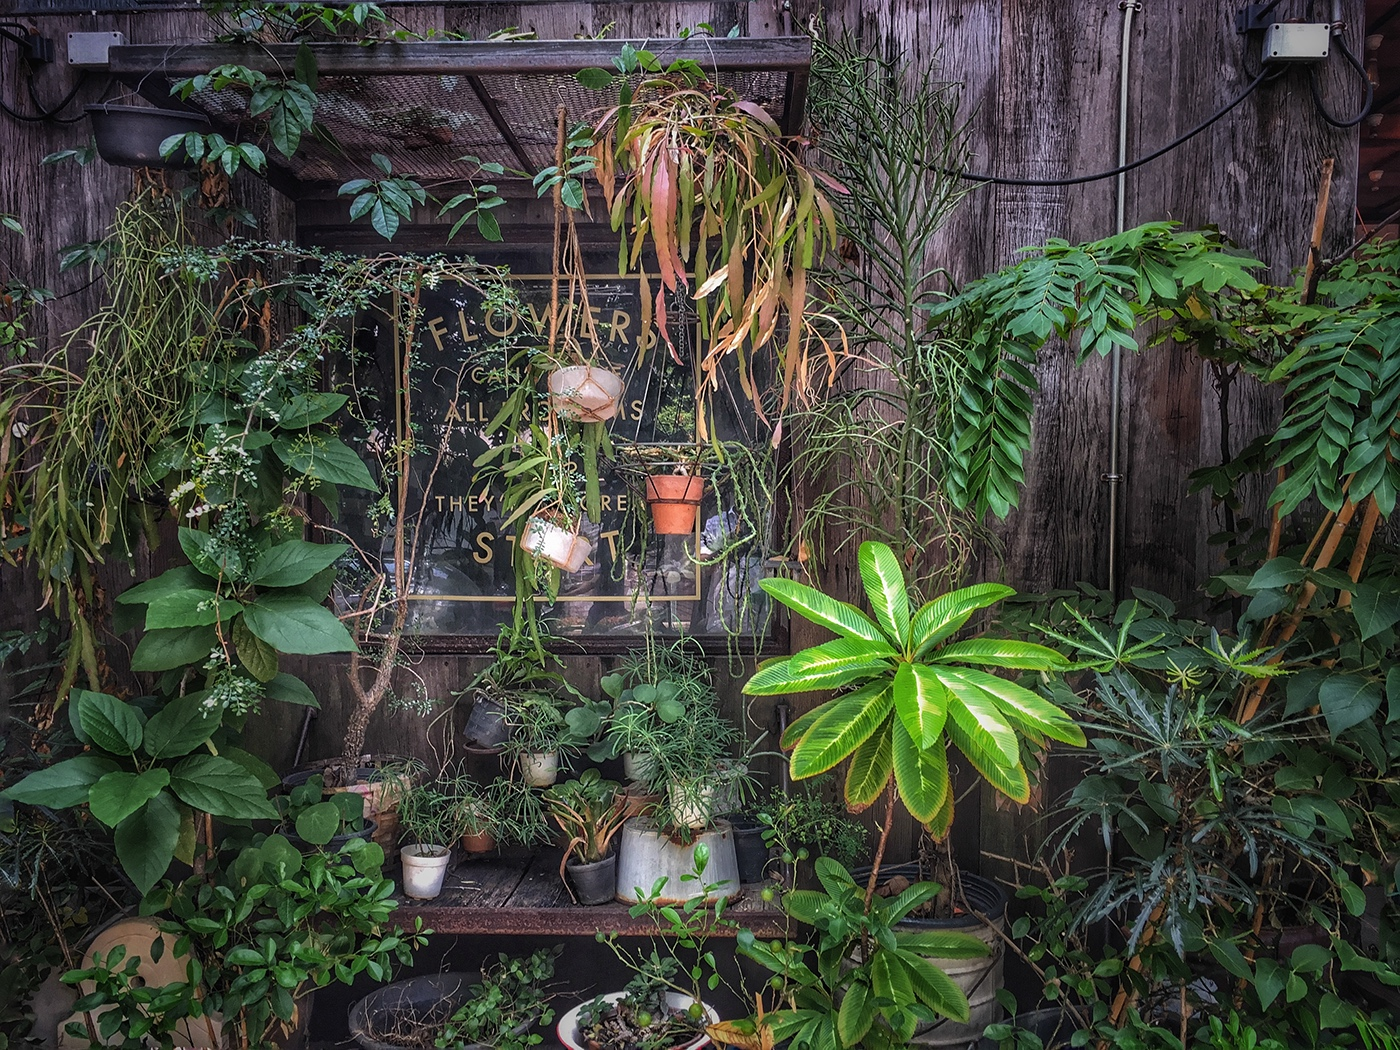 The Curious Little Flower Shoppe / фото Sandip K T